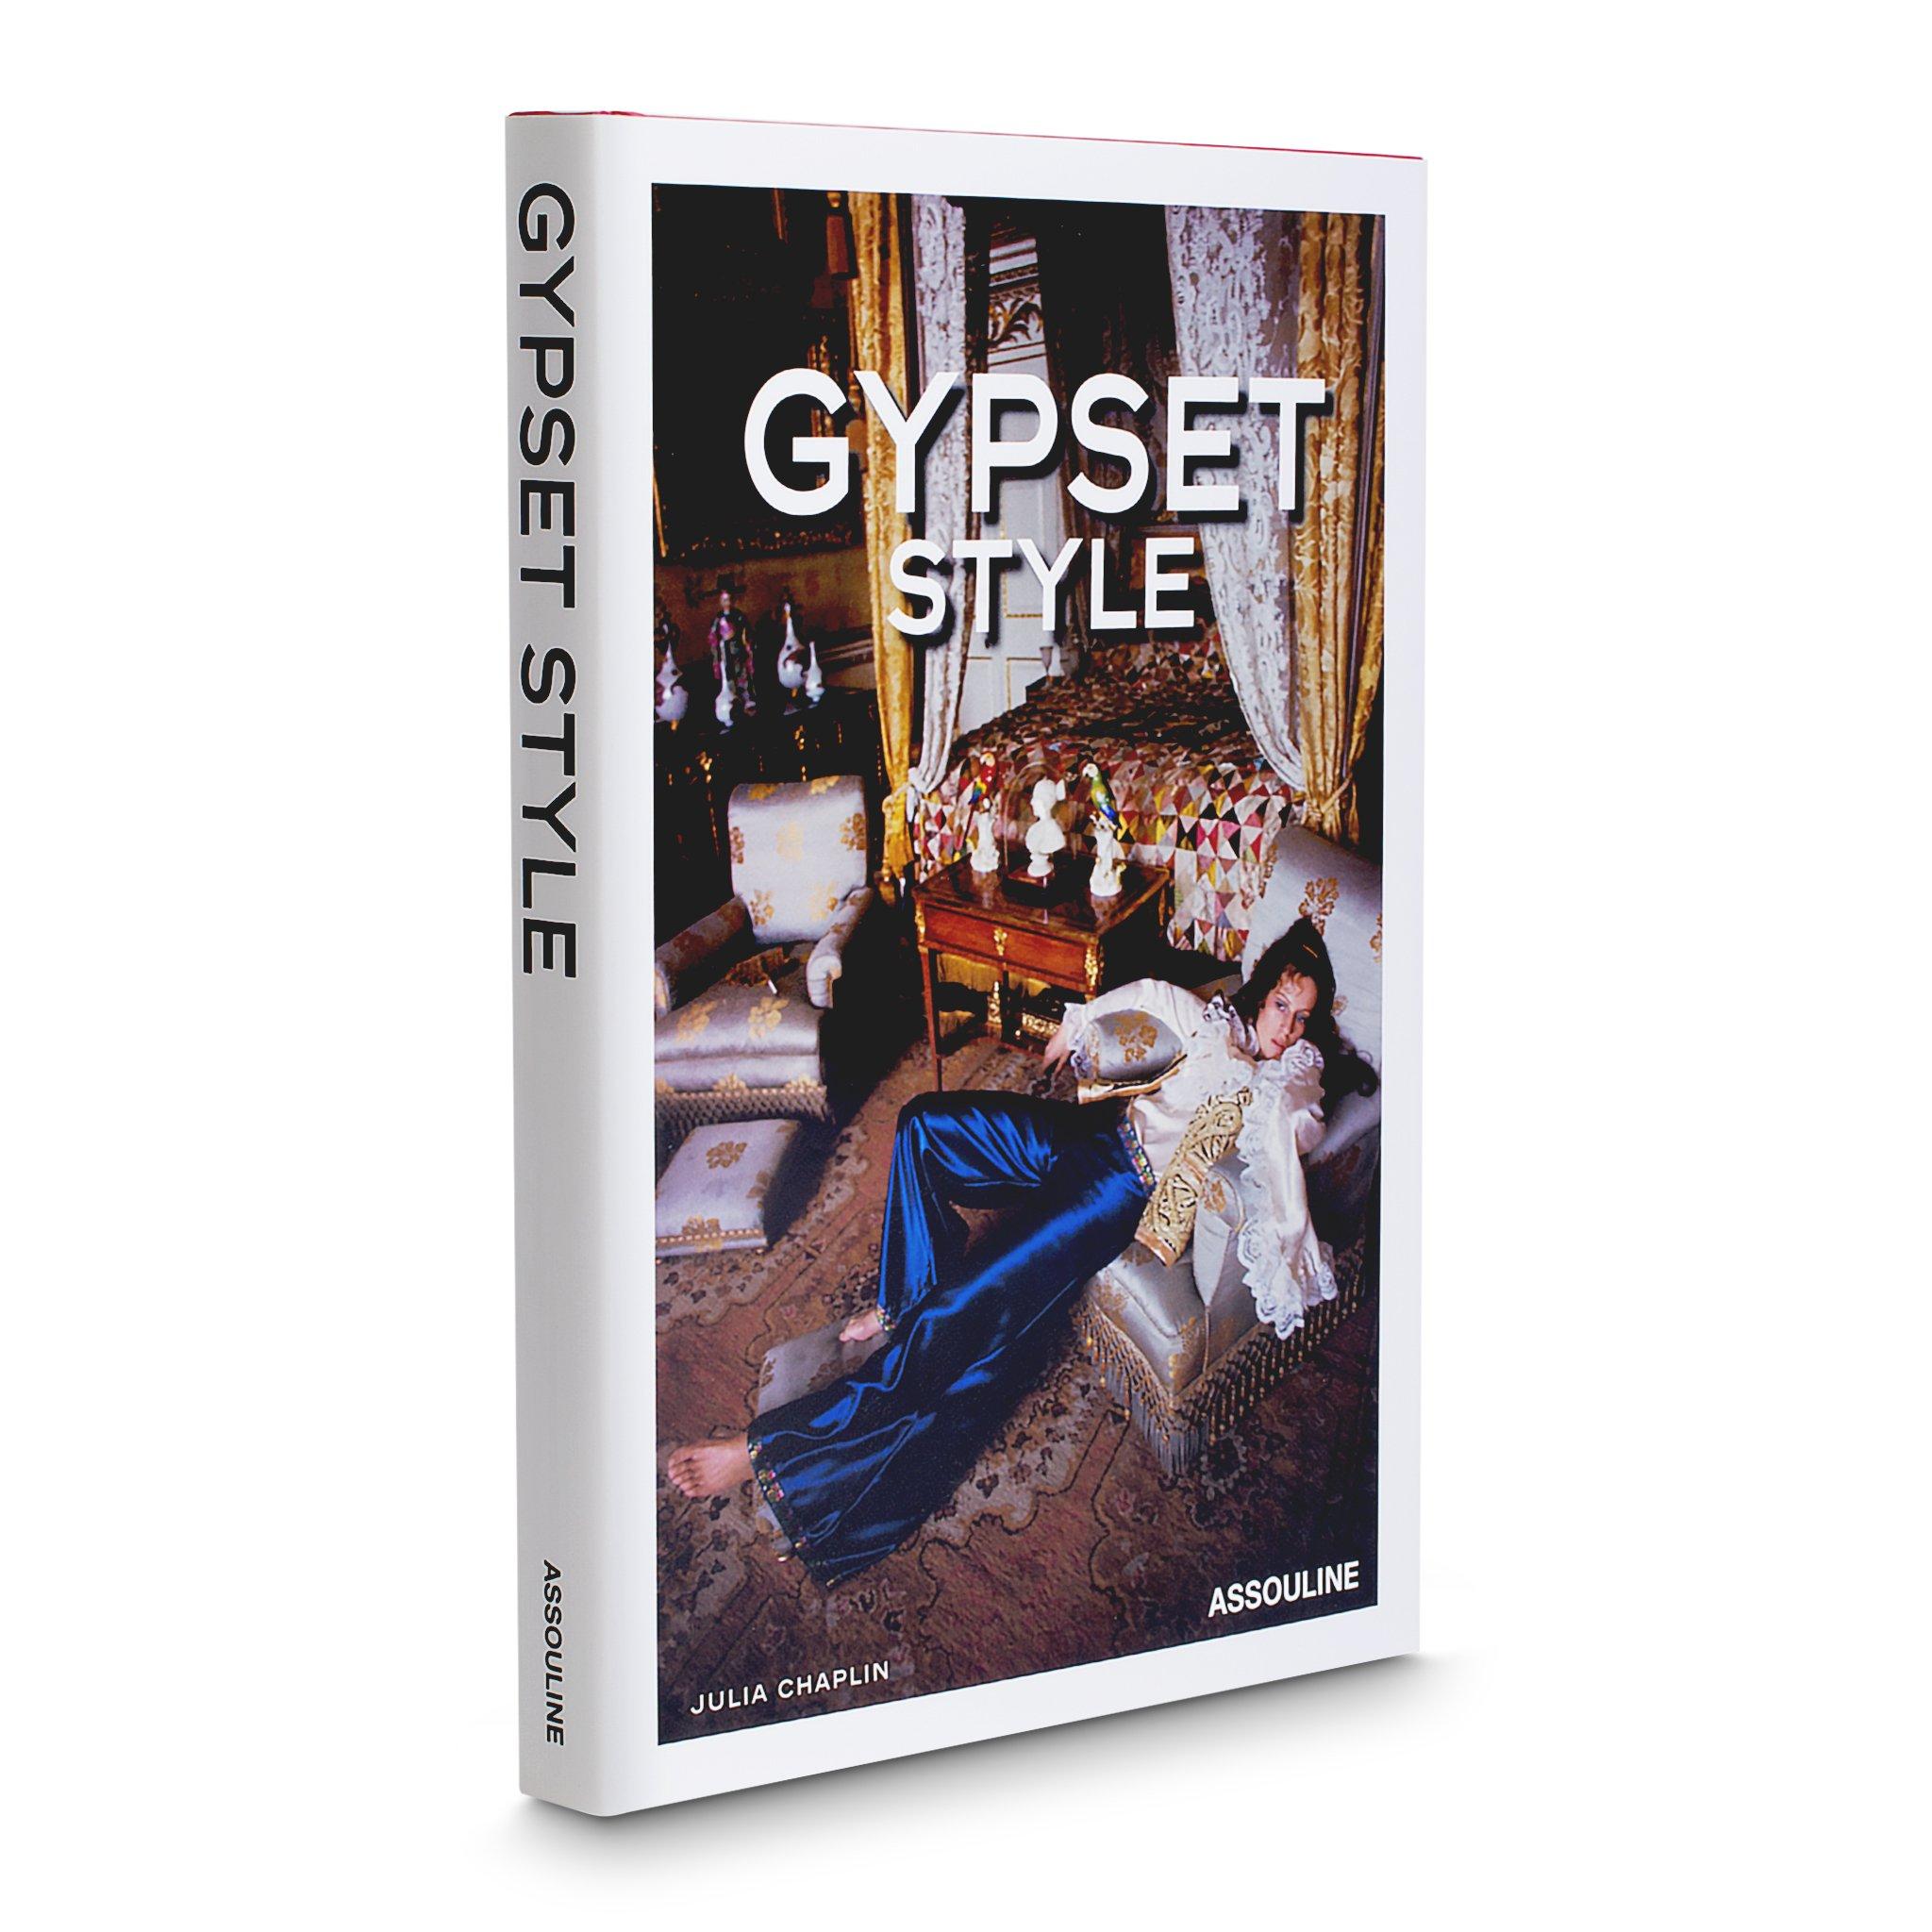 Gypset Style: Jet Set + Gypsy = Gypset (Icons)